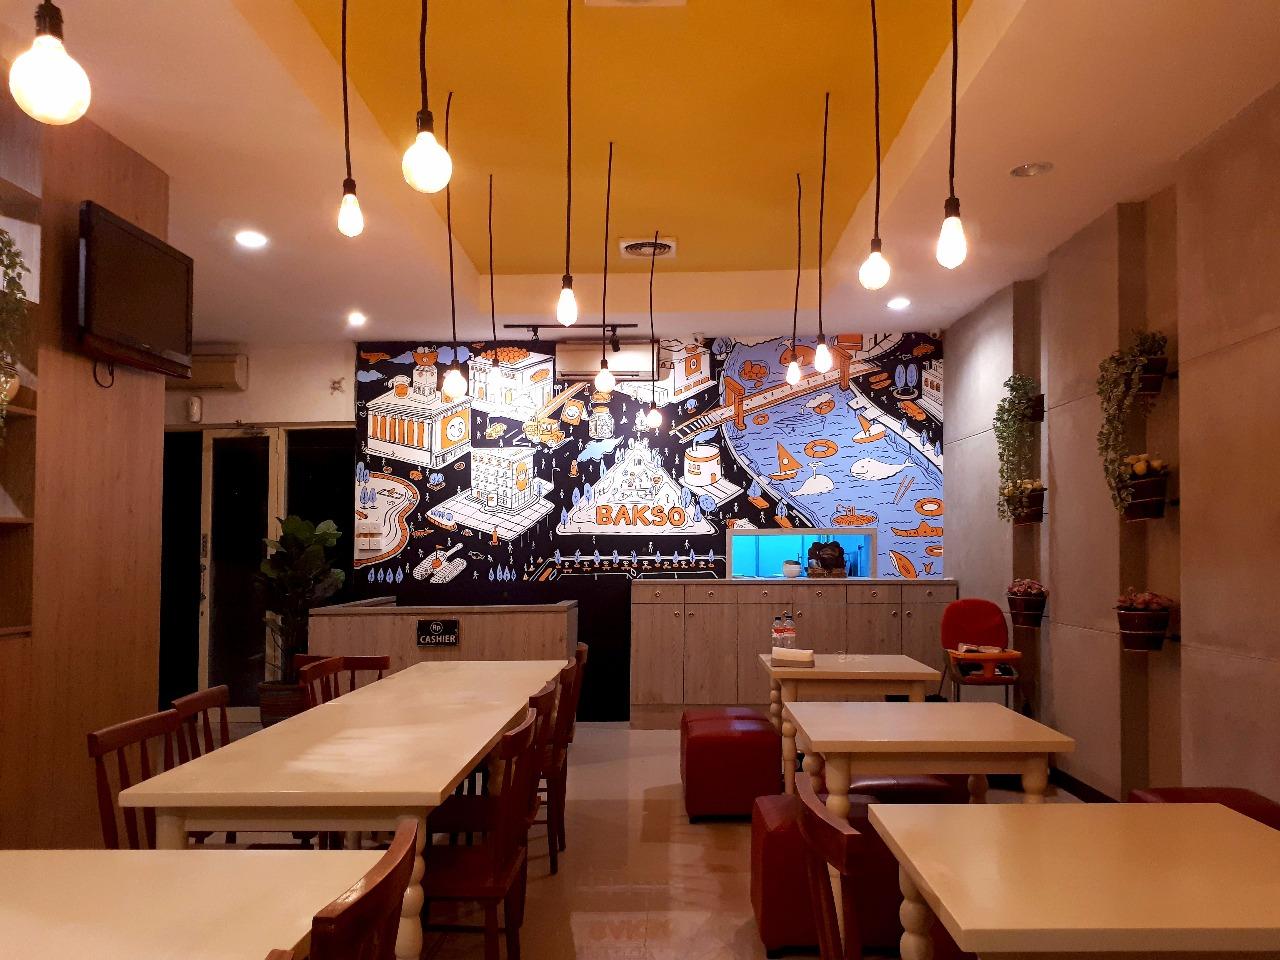 bali mural service